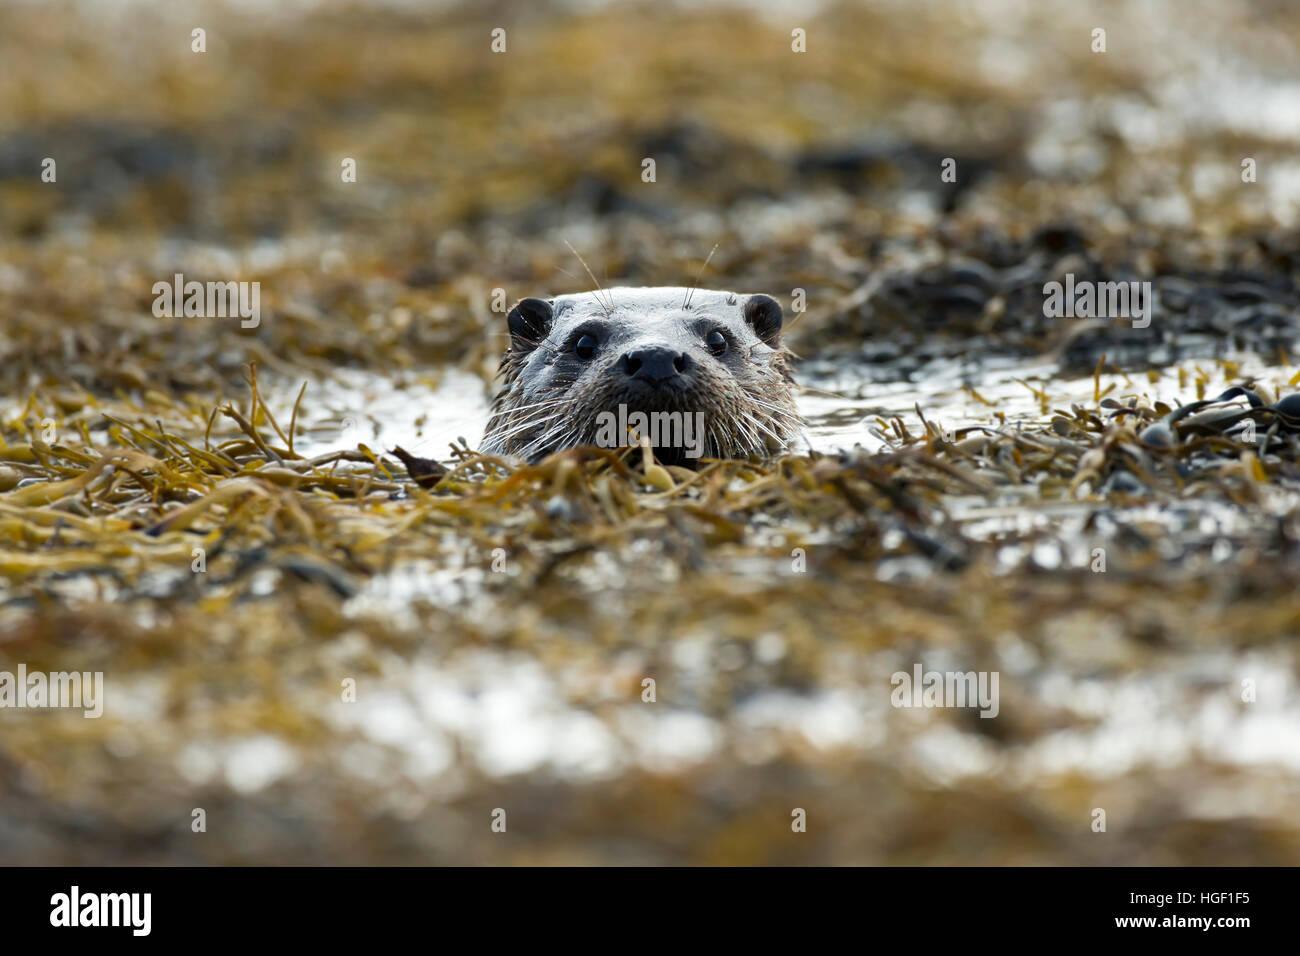 Eurasische Fischotter (Lutra Lutra) in den Algen schwimmen Stockbild